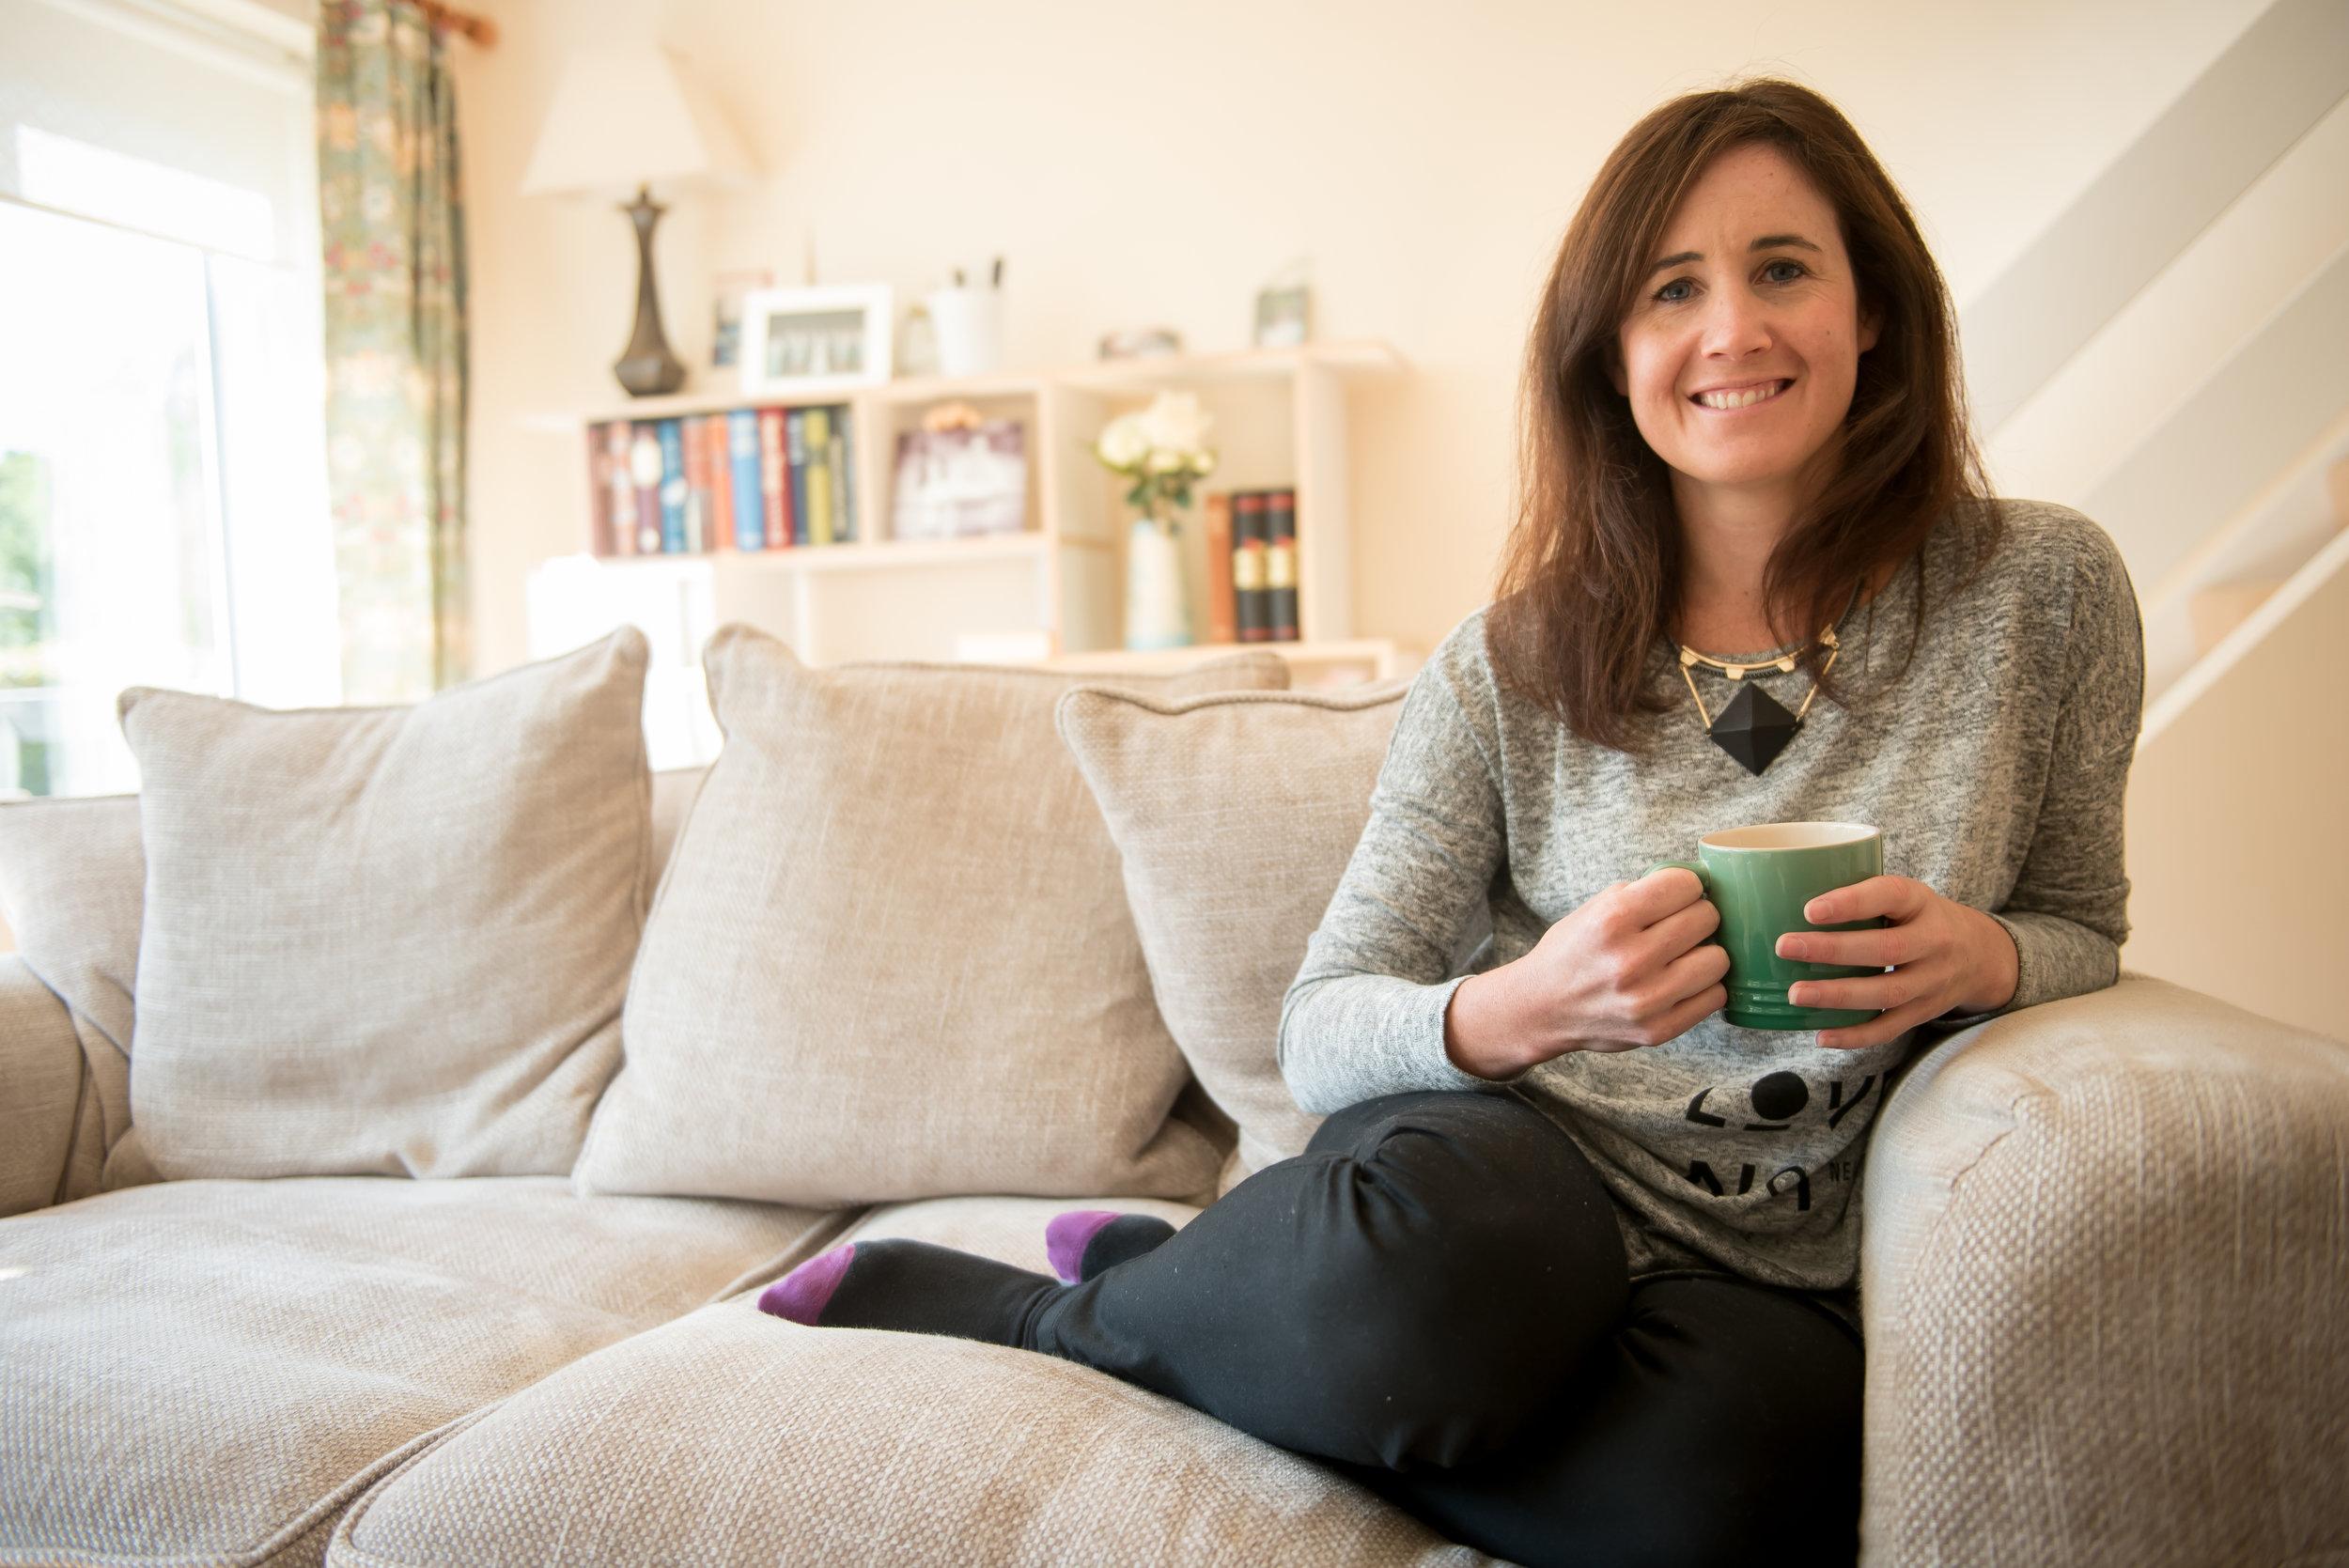 Woman in Progress: Kim Palmer, creator of Clementine